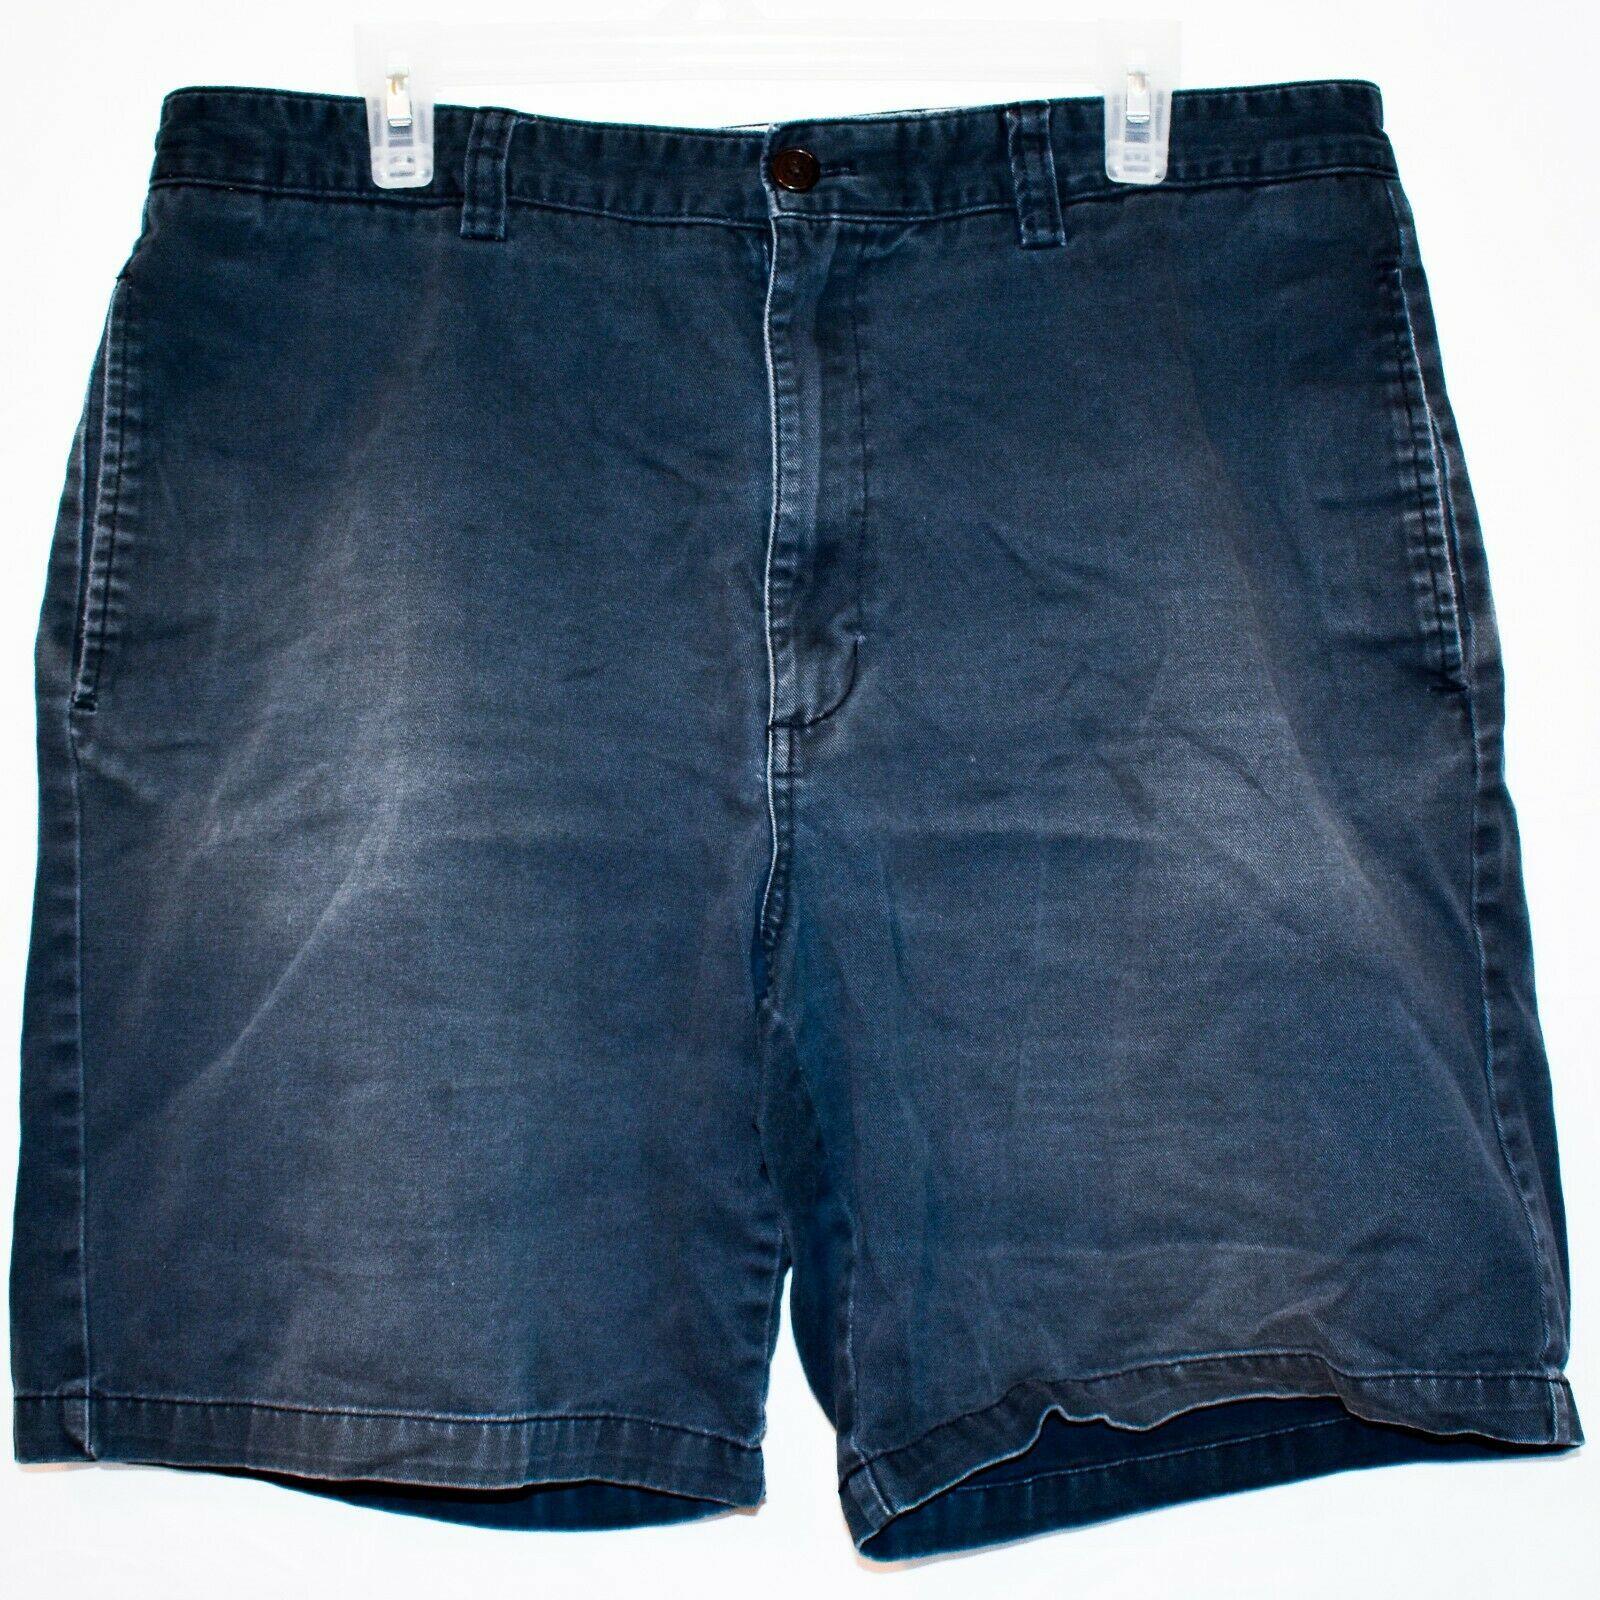 Chaps by Ralph Lauren Flat Front Faded Navy Blue Men's Cotton Shorts Size 36